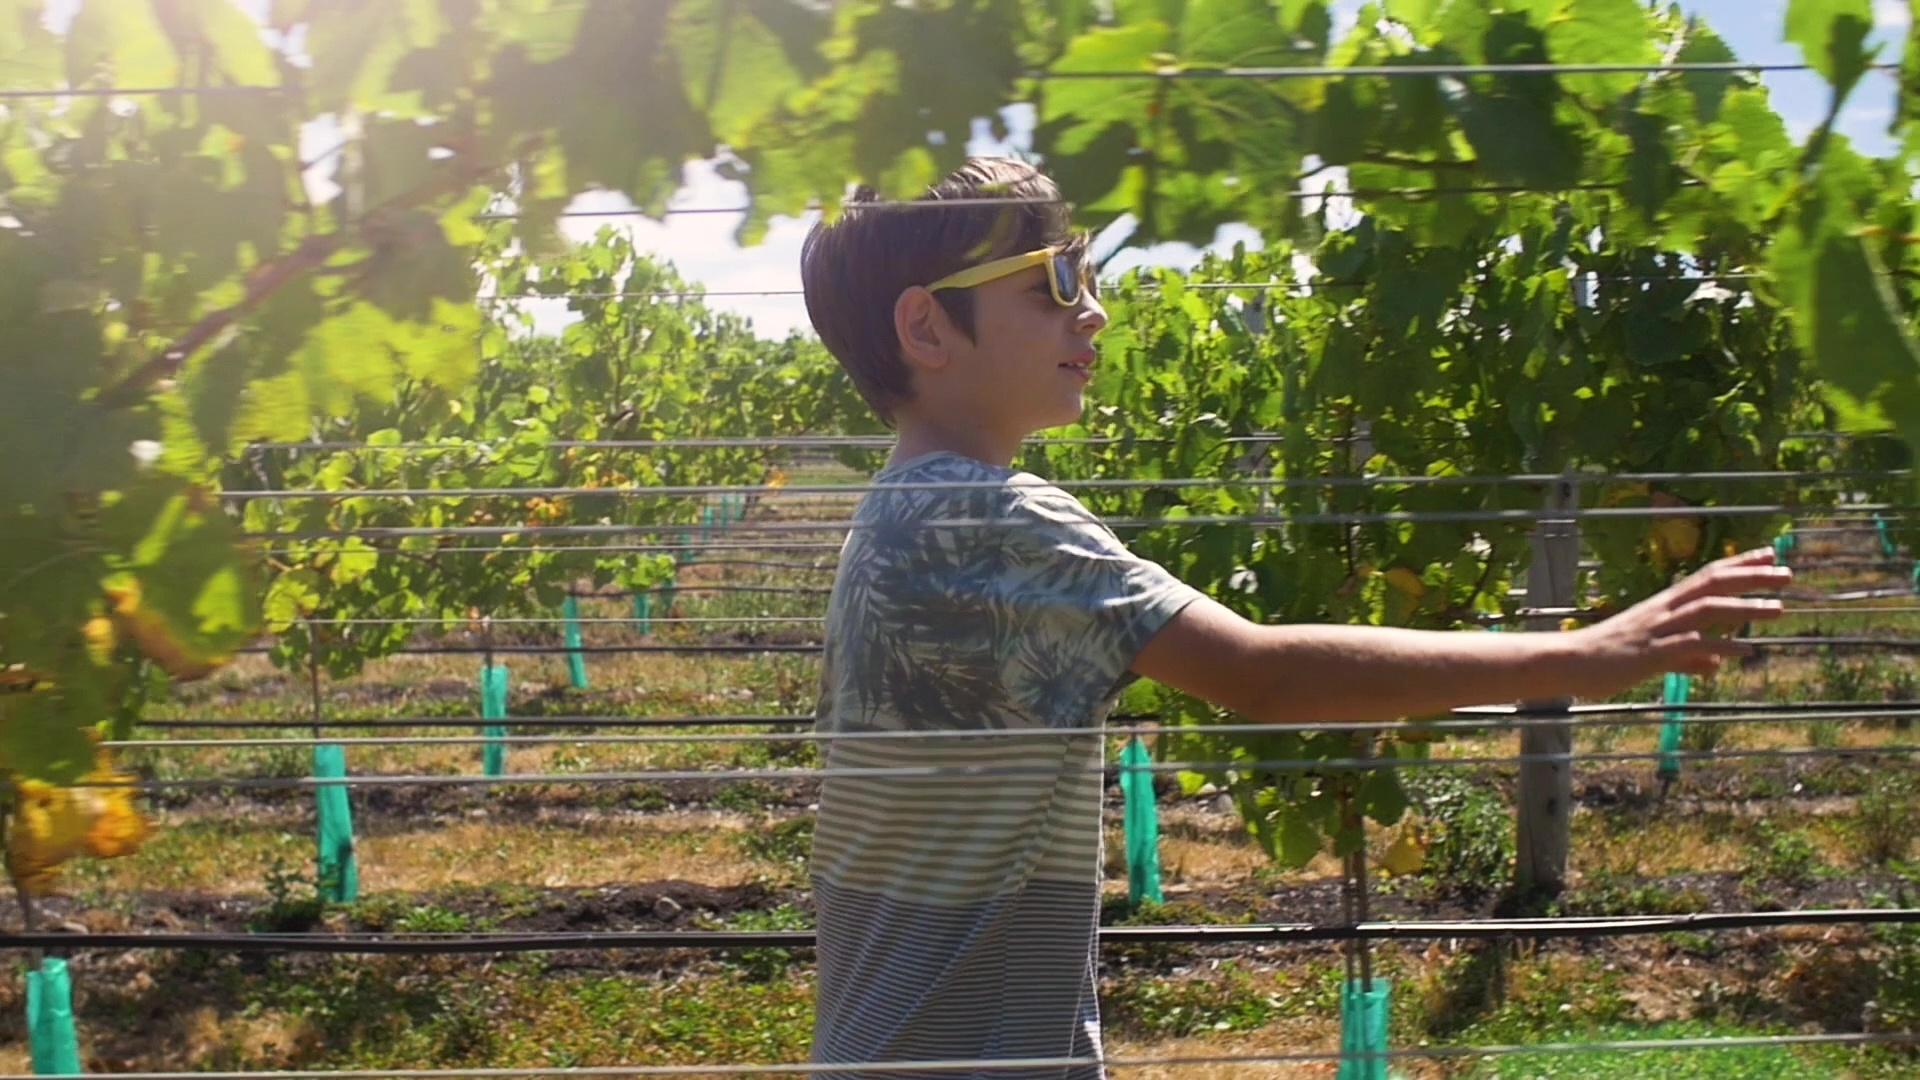 Schoolhouse Rocked Teaser Trailer - Boy in a vineyard